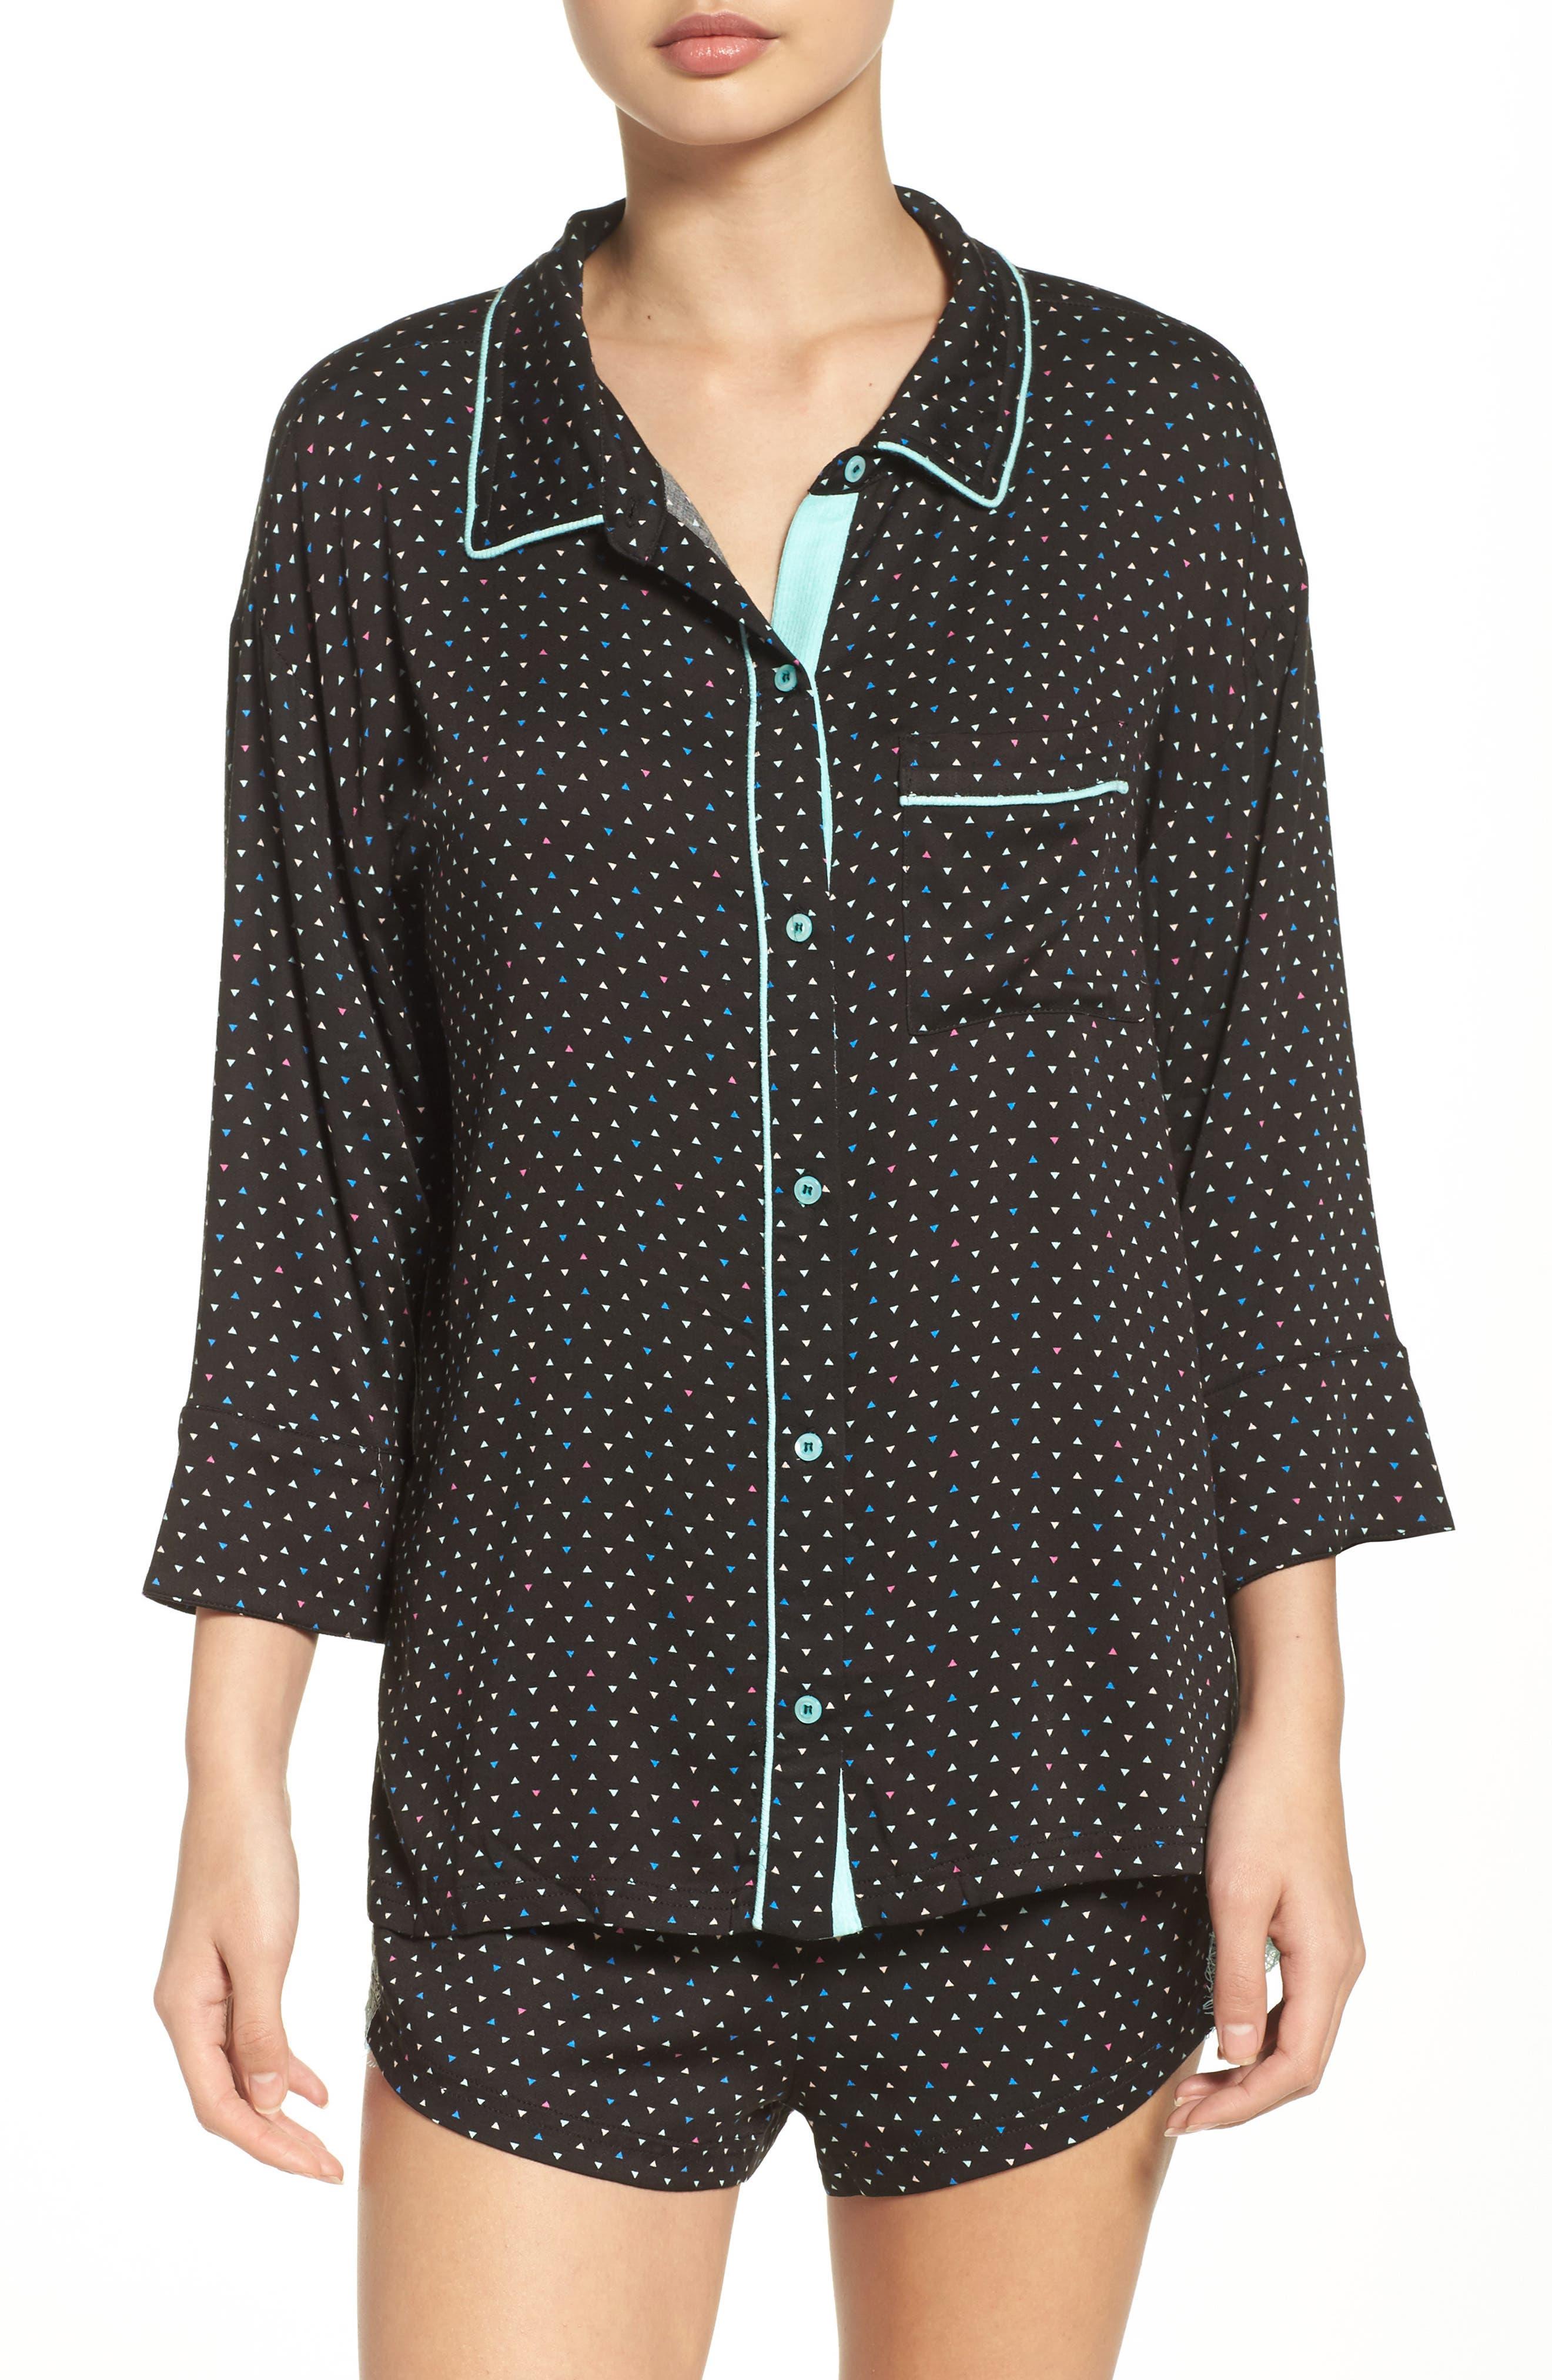 Alternate Image 1 Selected - Honeydew Intimates Breakaway Pajamas